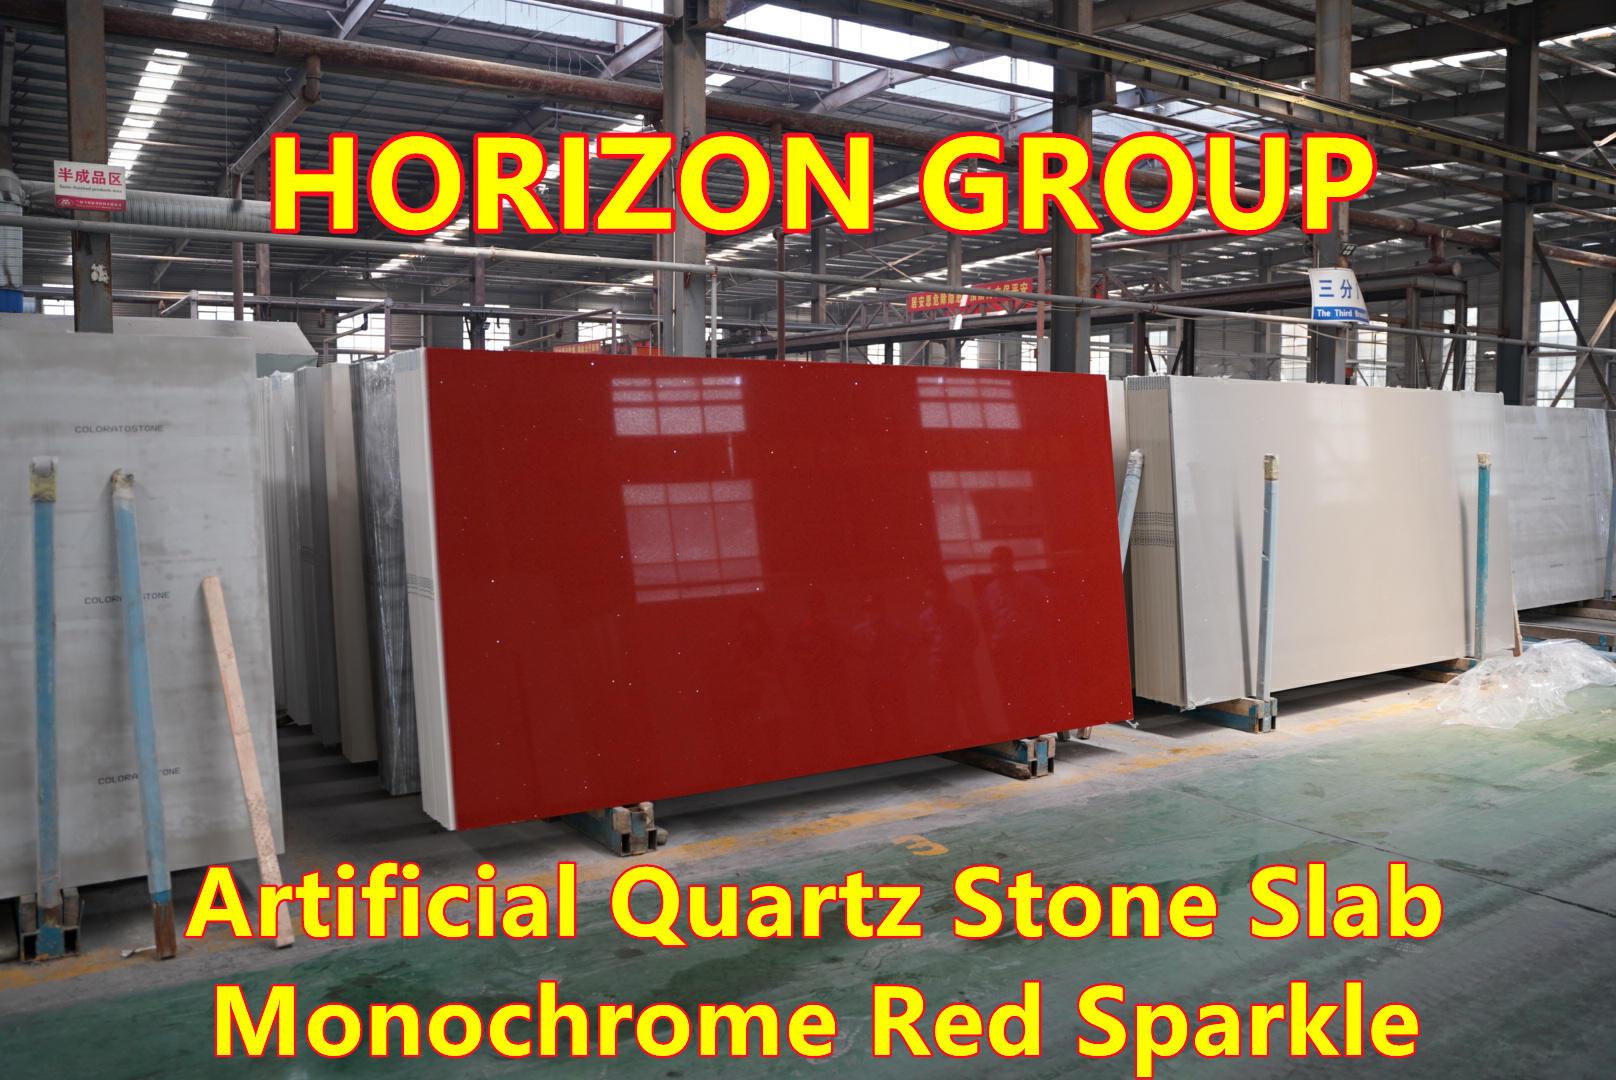 Artificial quartz stone Monochrome Red Sparkle